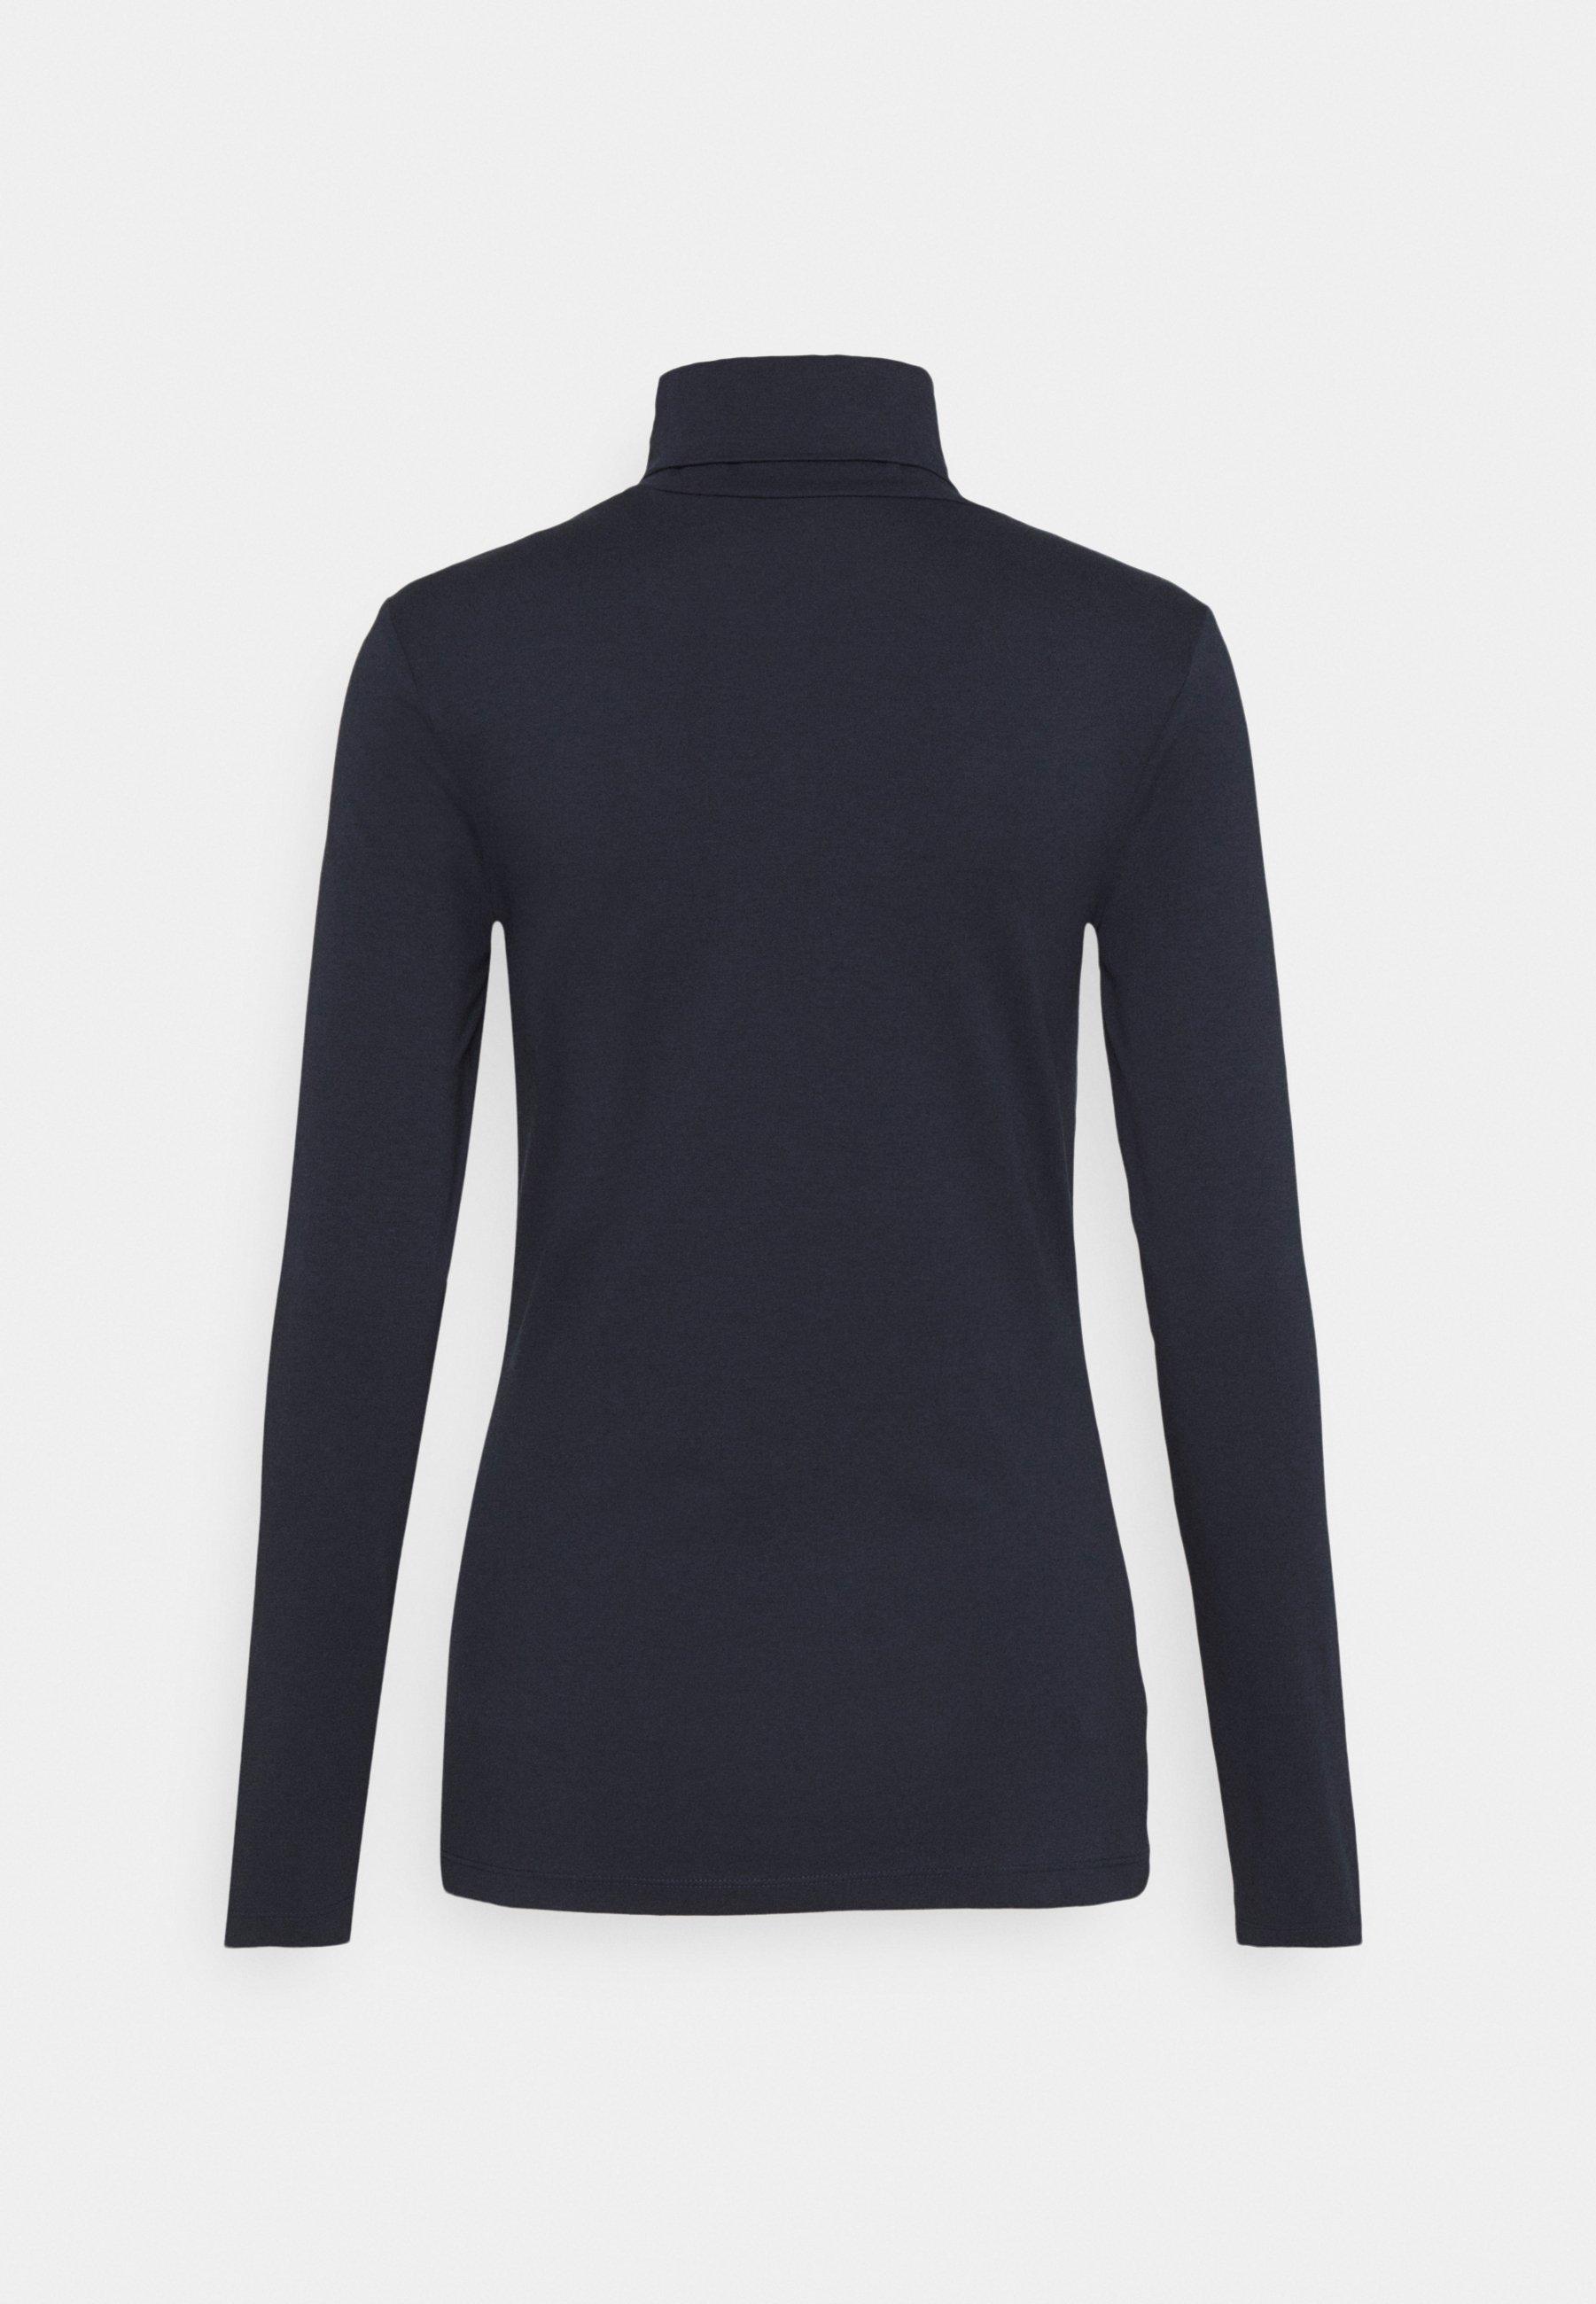 Esprit Core - Topper Langermet Navy/mørkeblå